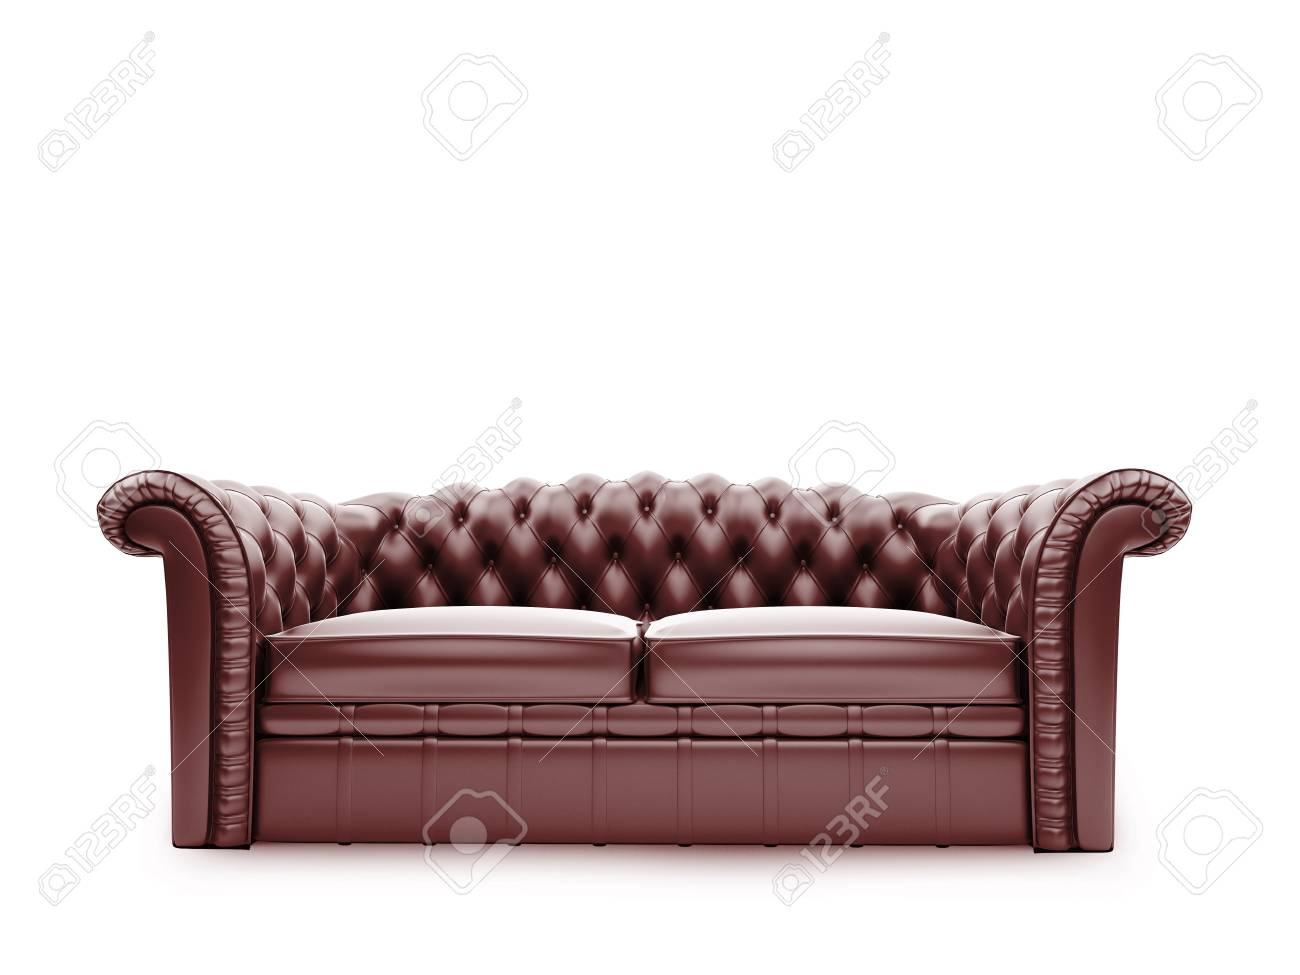 isolated furniture on white background Stock Photo - 2320277